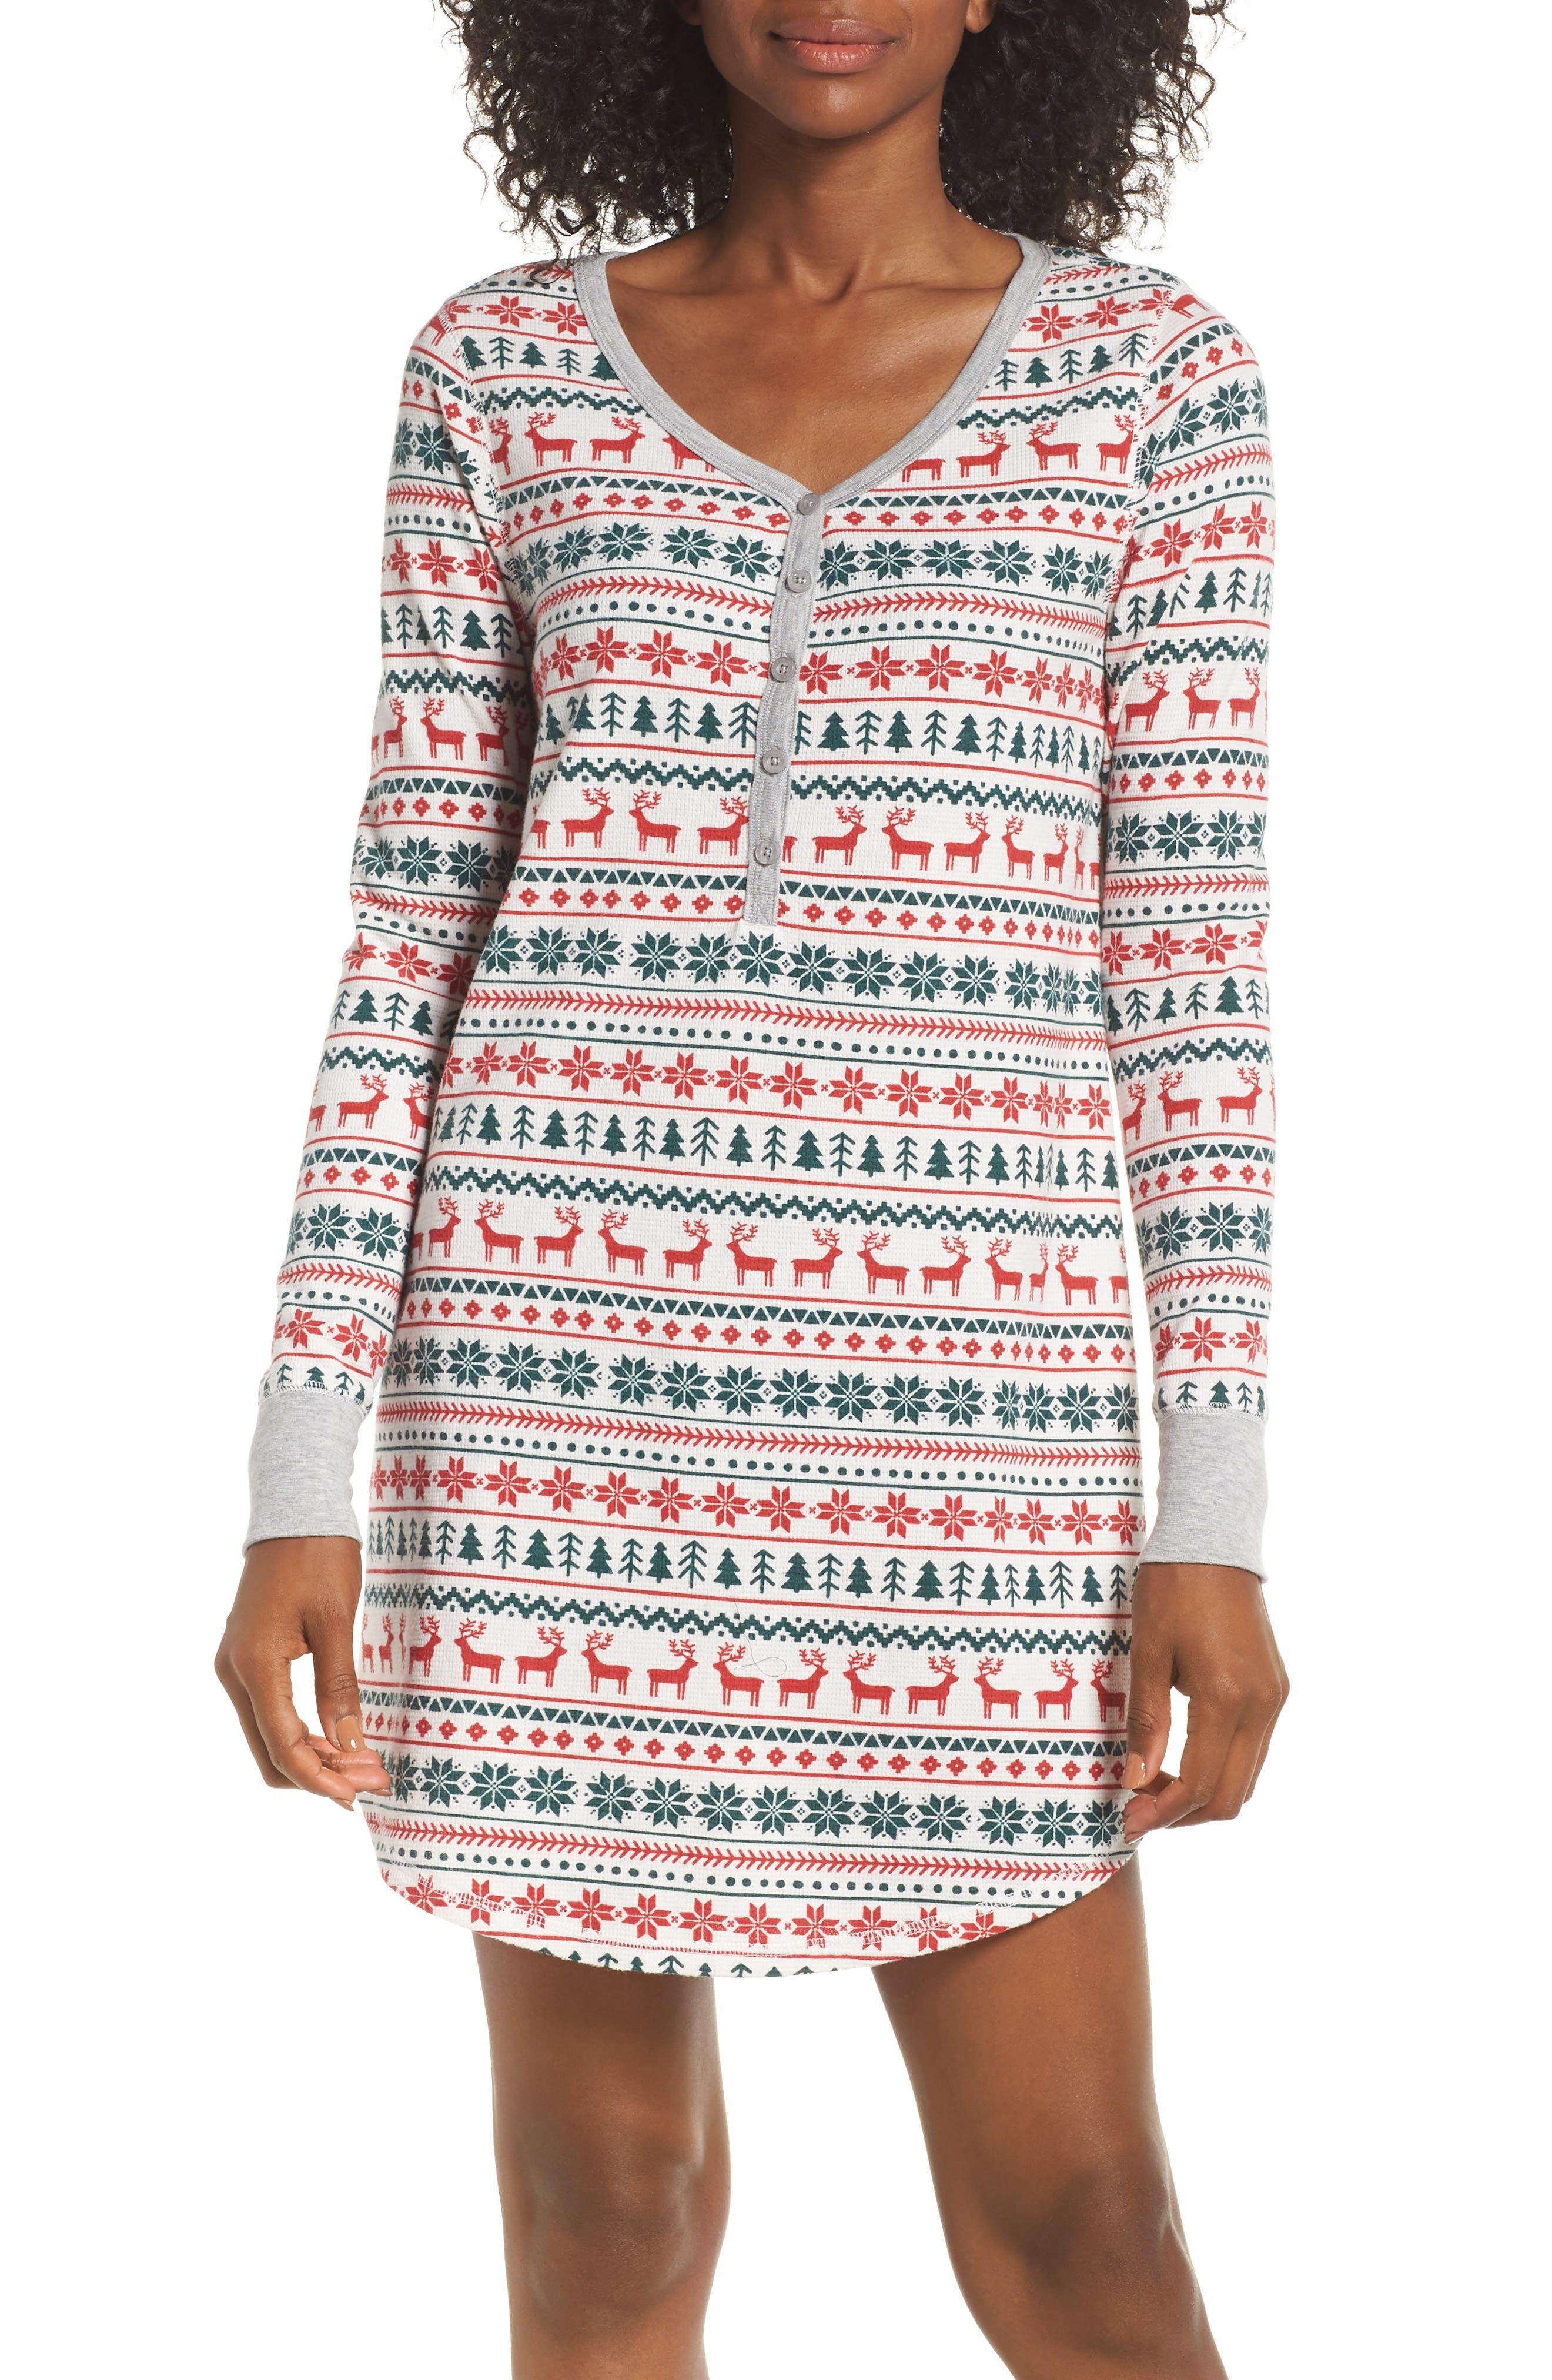 Lingerie Sleepyhead Thermal Nightshirt,                         Main,                         color, IVORY EGRET FAIRISLE SKETCH